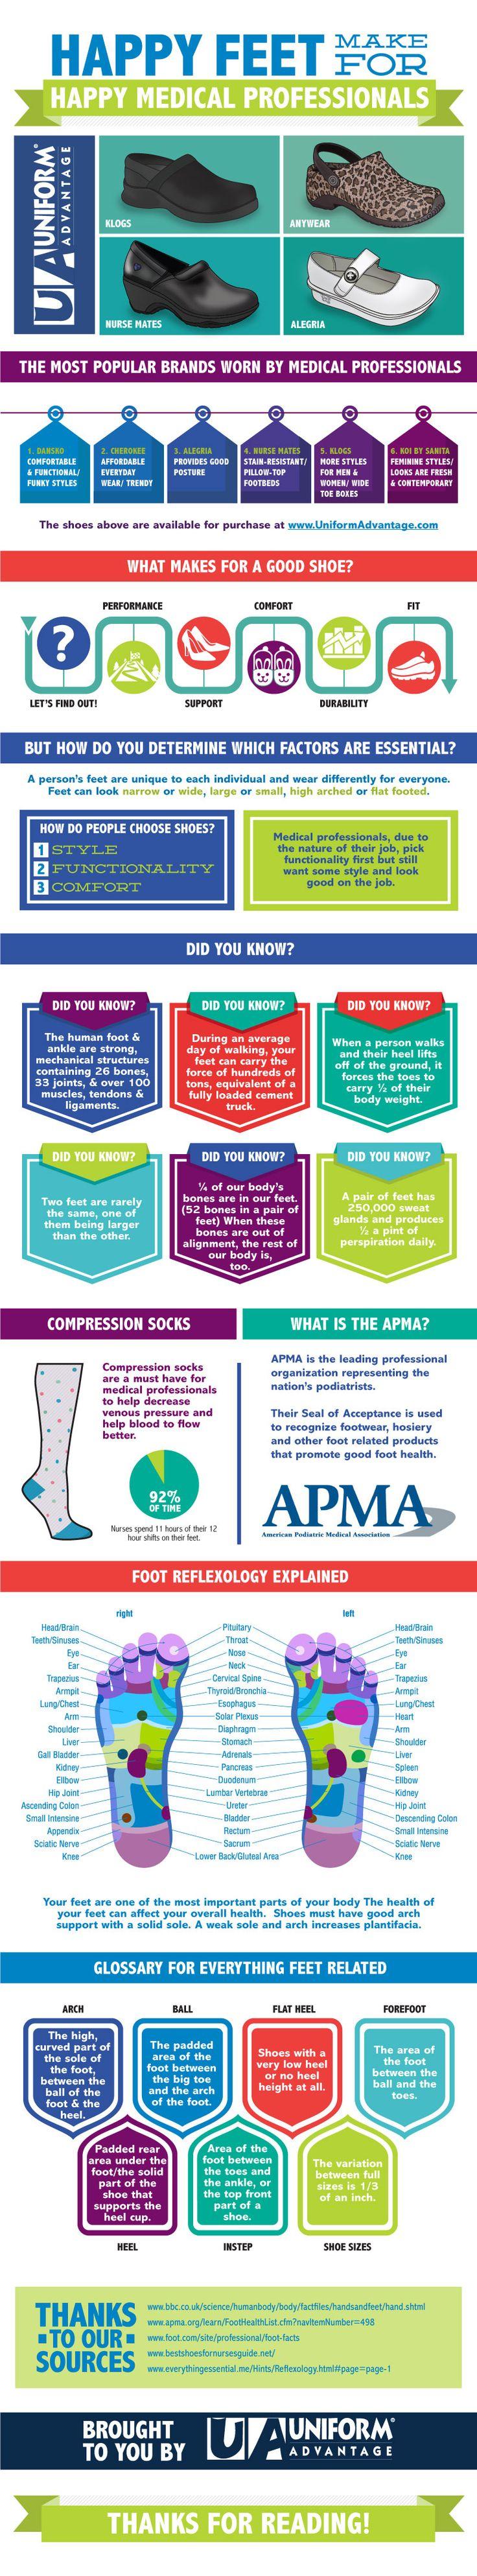 The right Nursing shoes make Happy Healthcare Professionals by Uniform Advantage